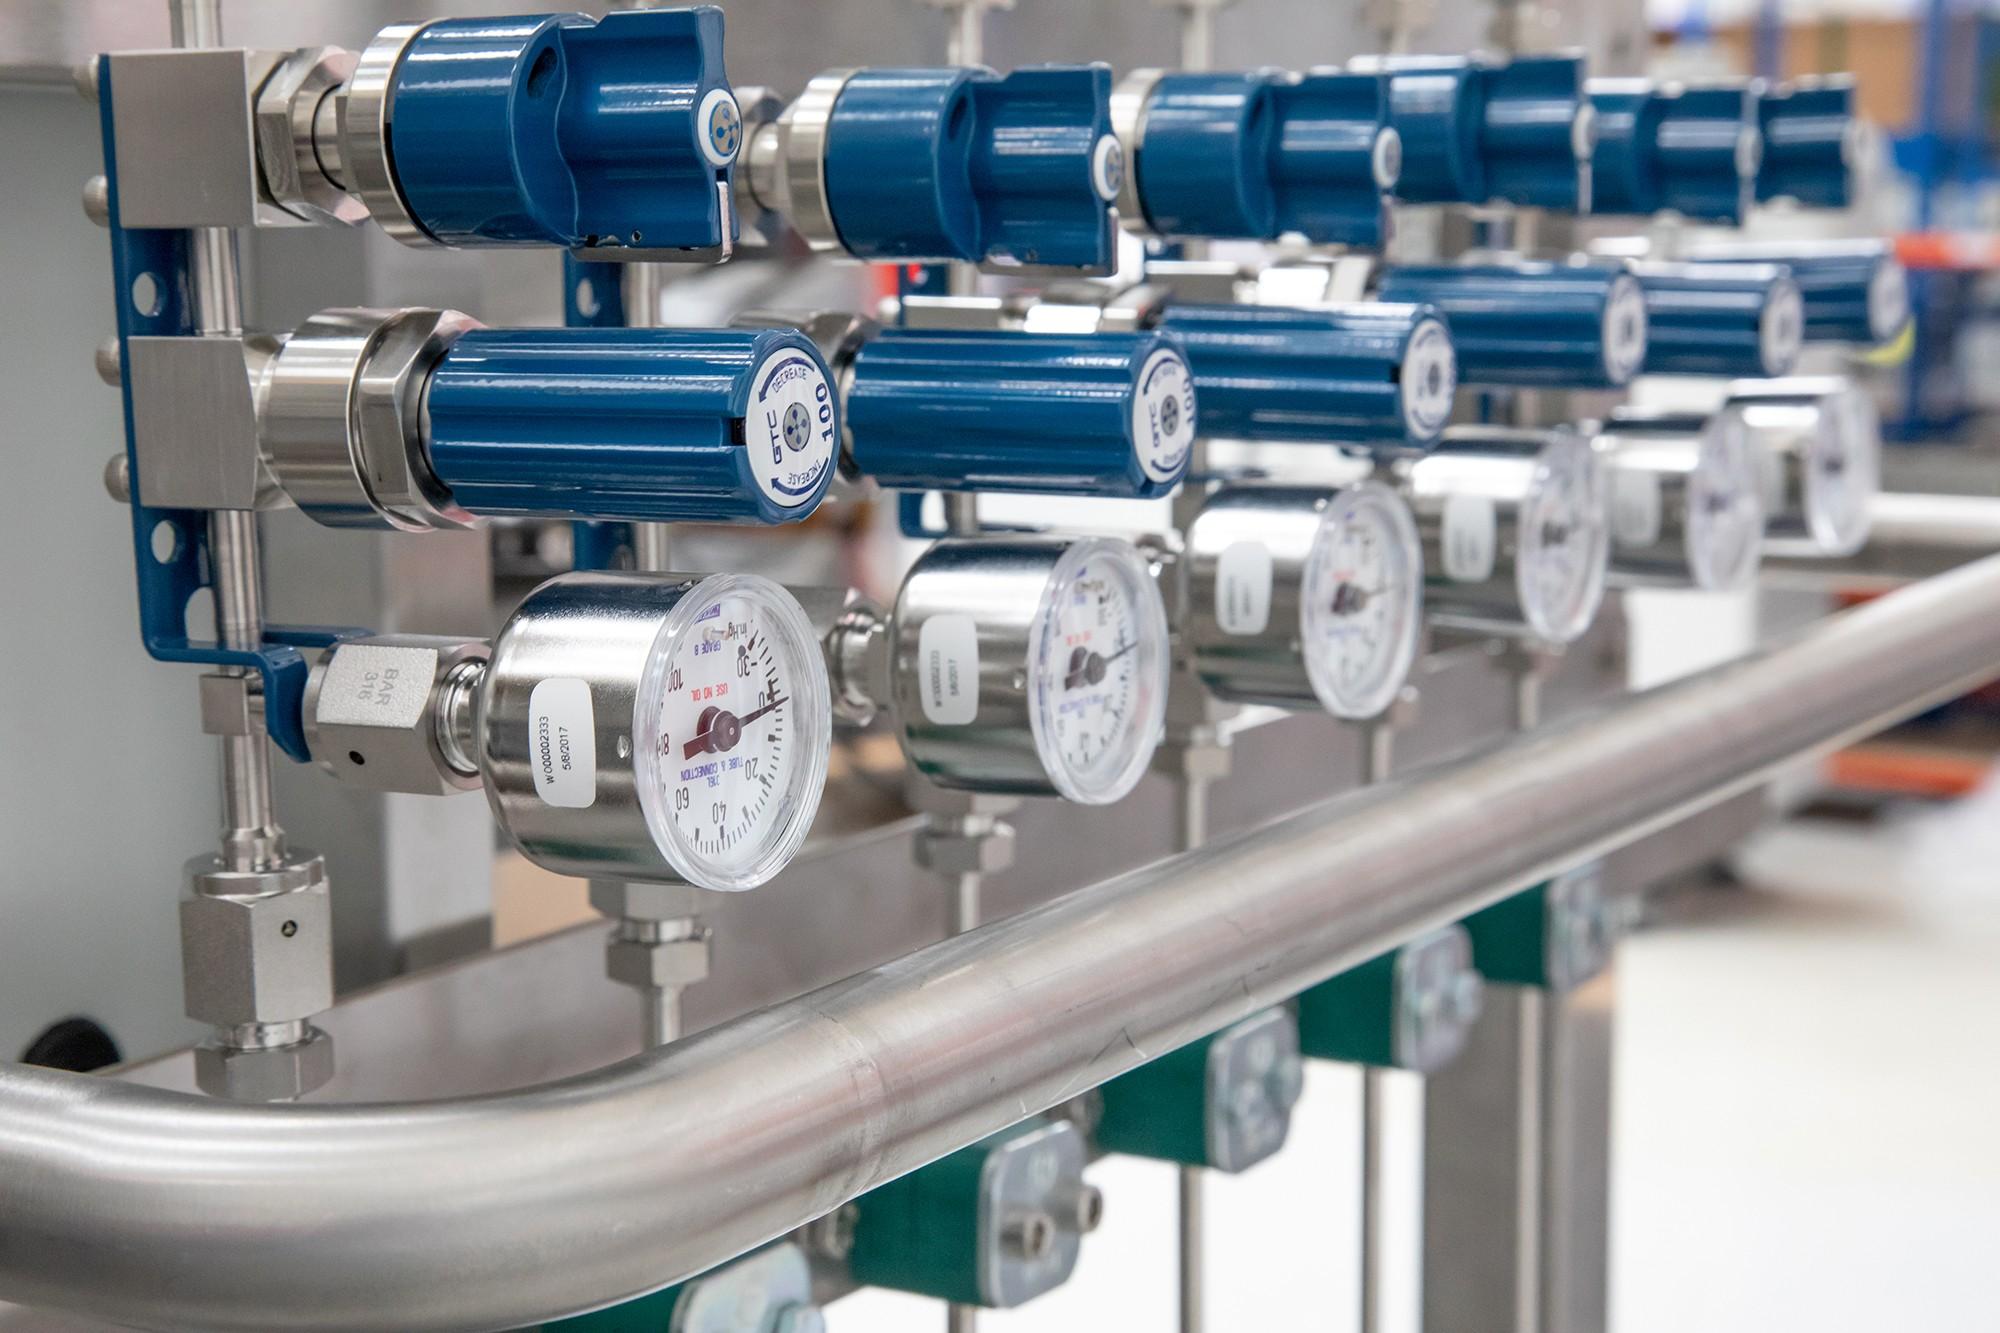 Pneumatics, hydraulics & fluid » pp 50 » PP Control & Automation